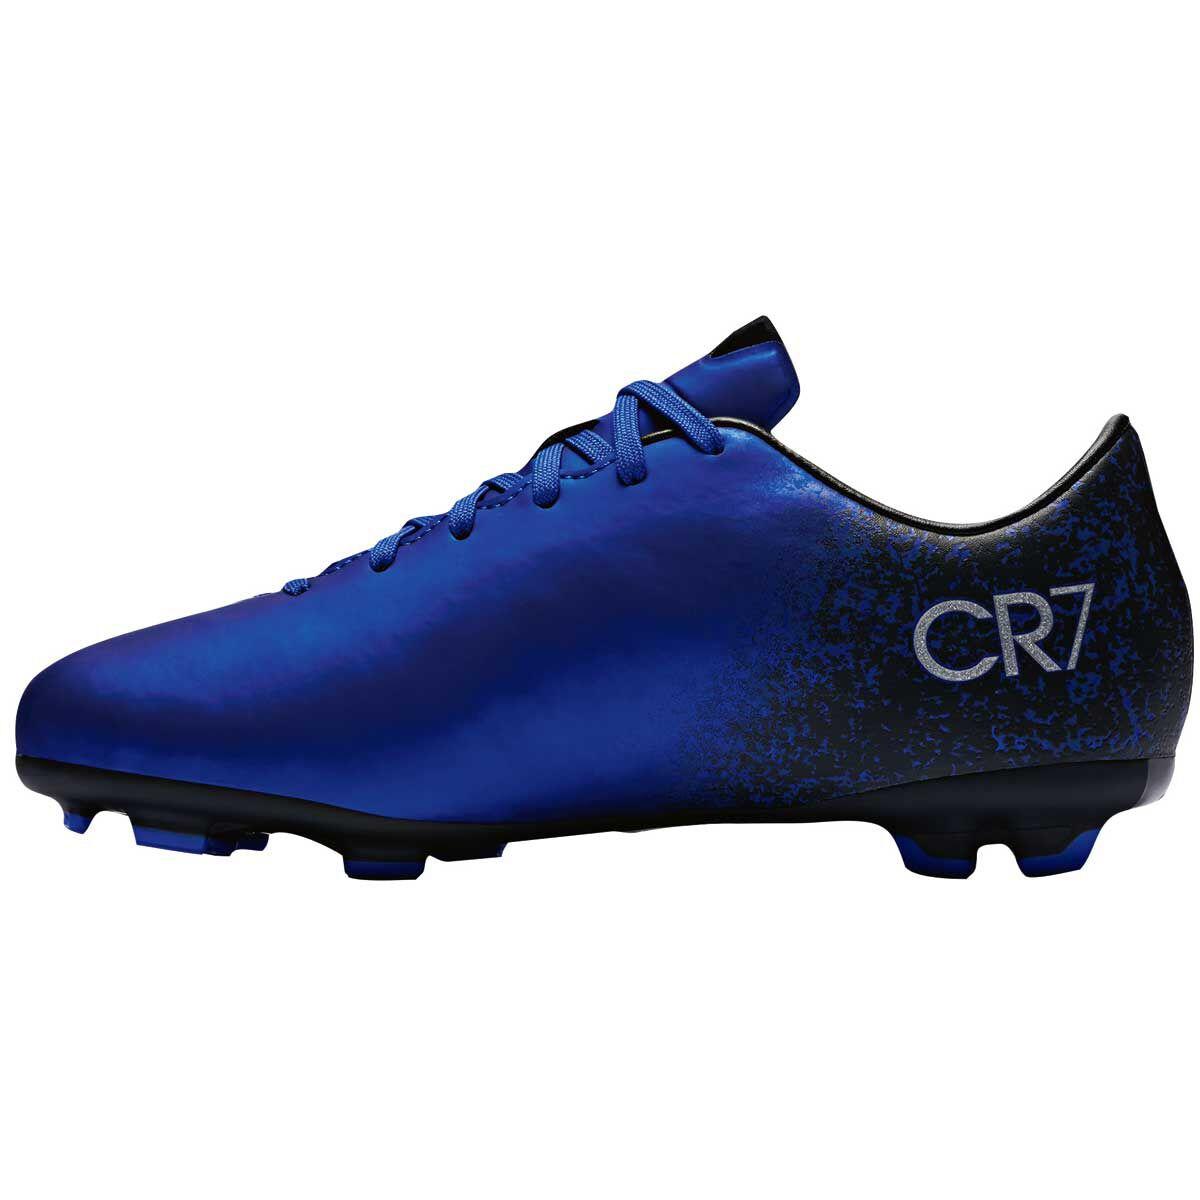 255664c8e ... spain nike mercurial victory v cr7 kids football boots blue silver us  10 junior blue 56547